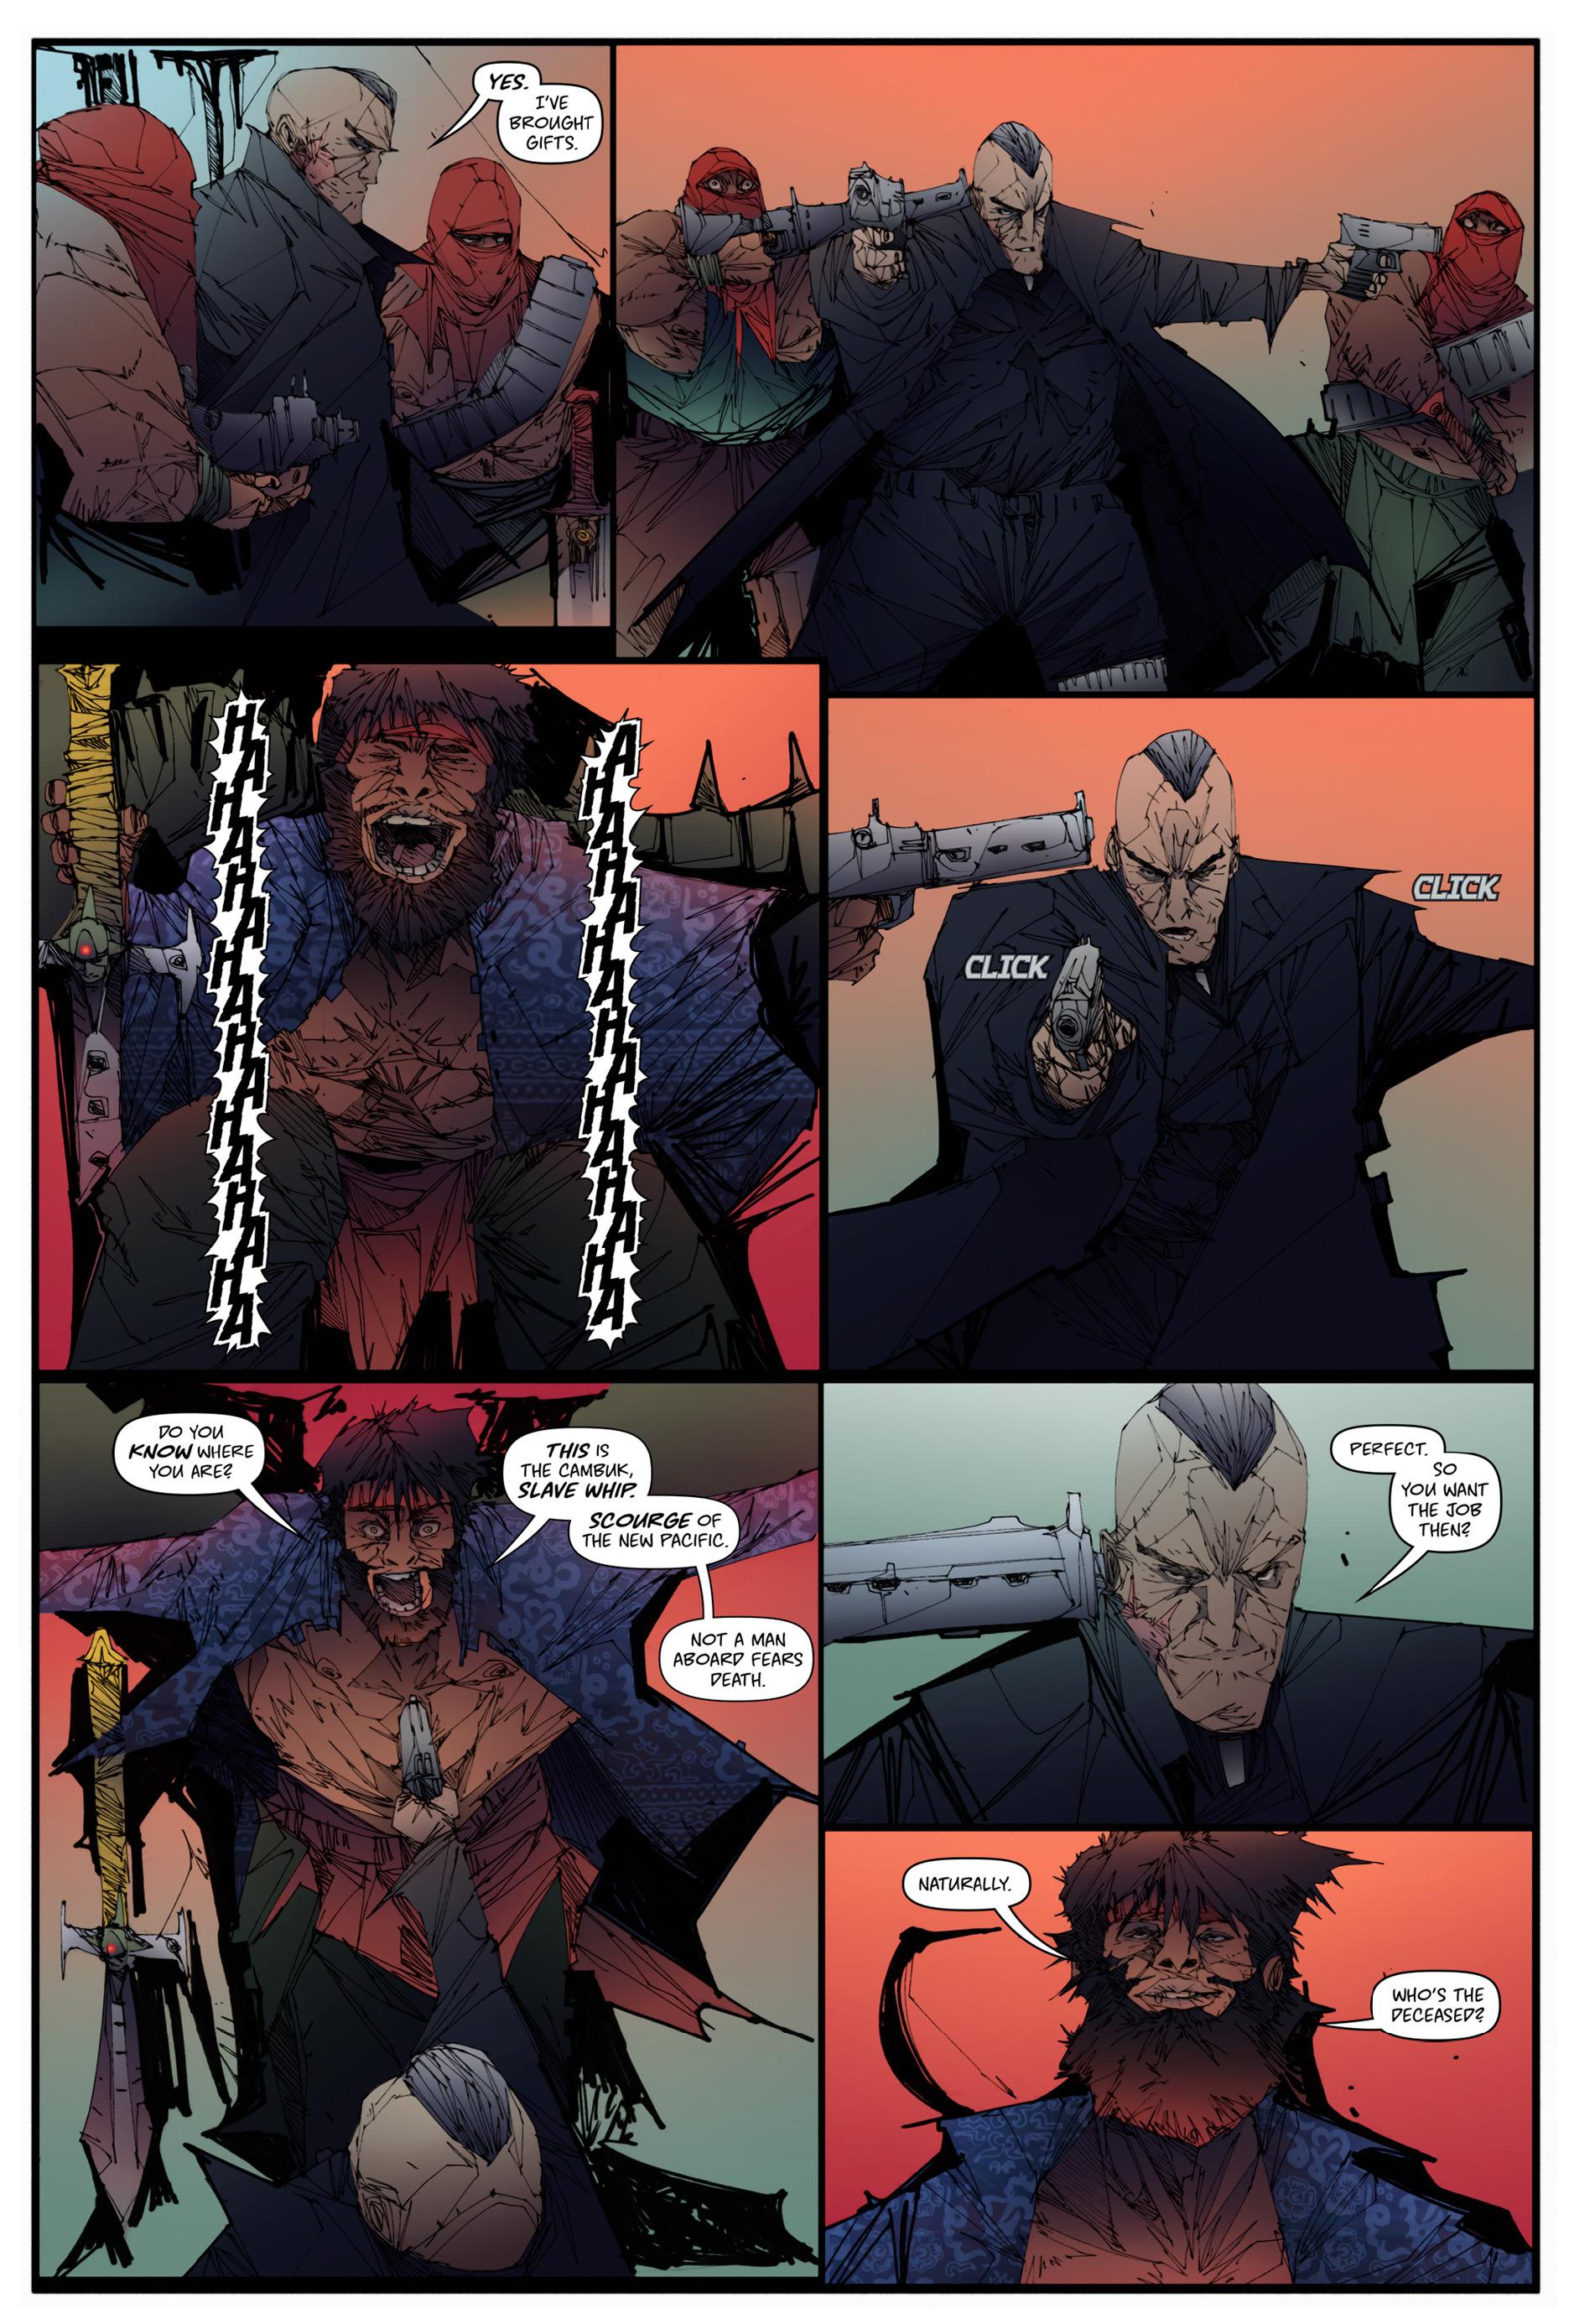 Read online Scrimshaw comic -  Issue #2 - 14